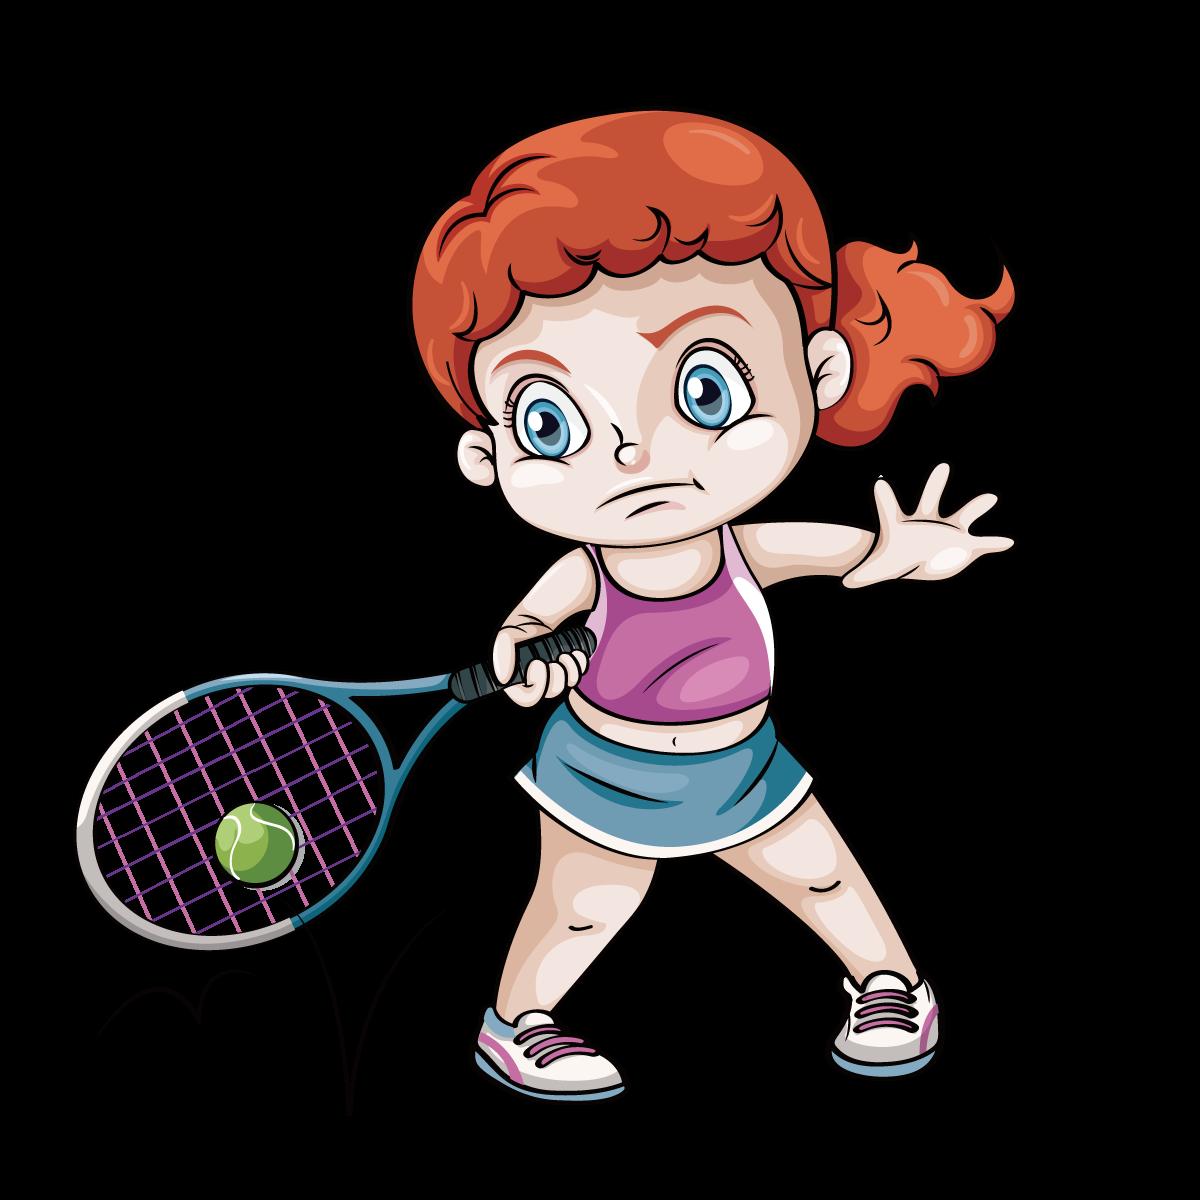 Racket at getdrawings com. Clipart children tennis